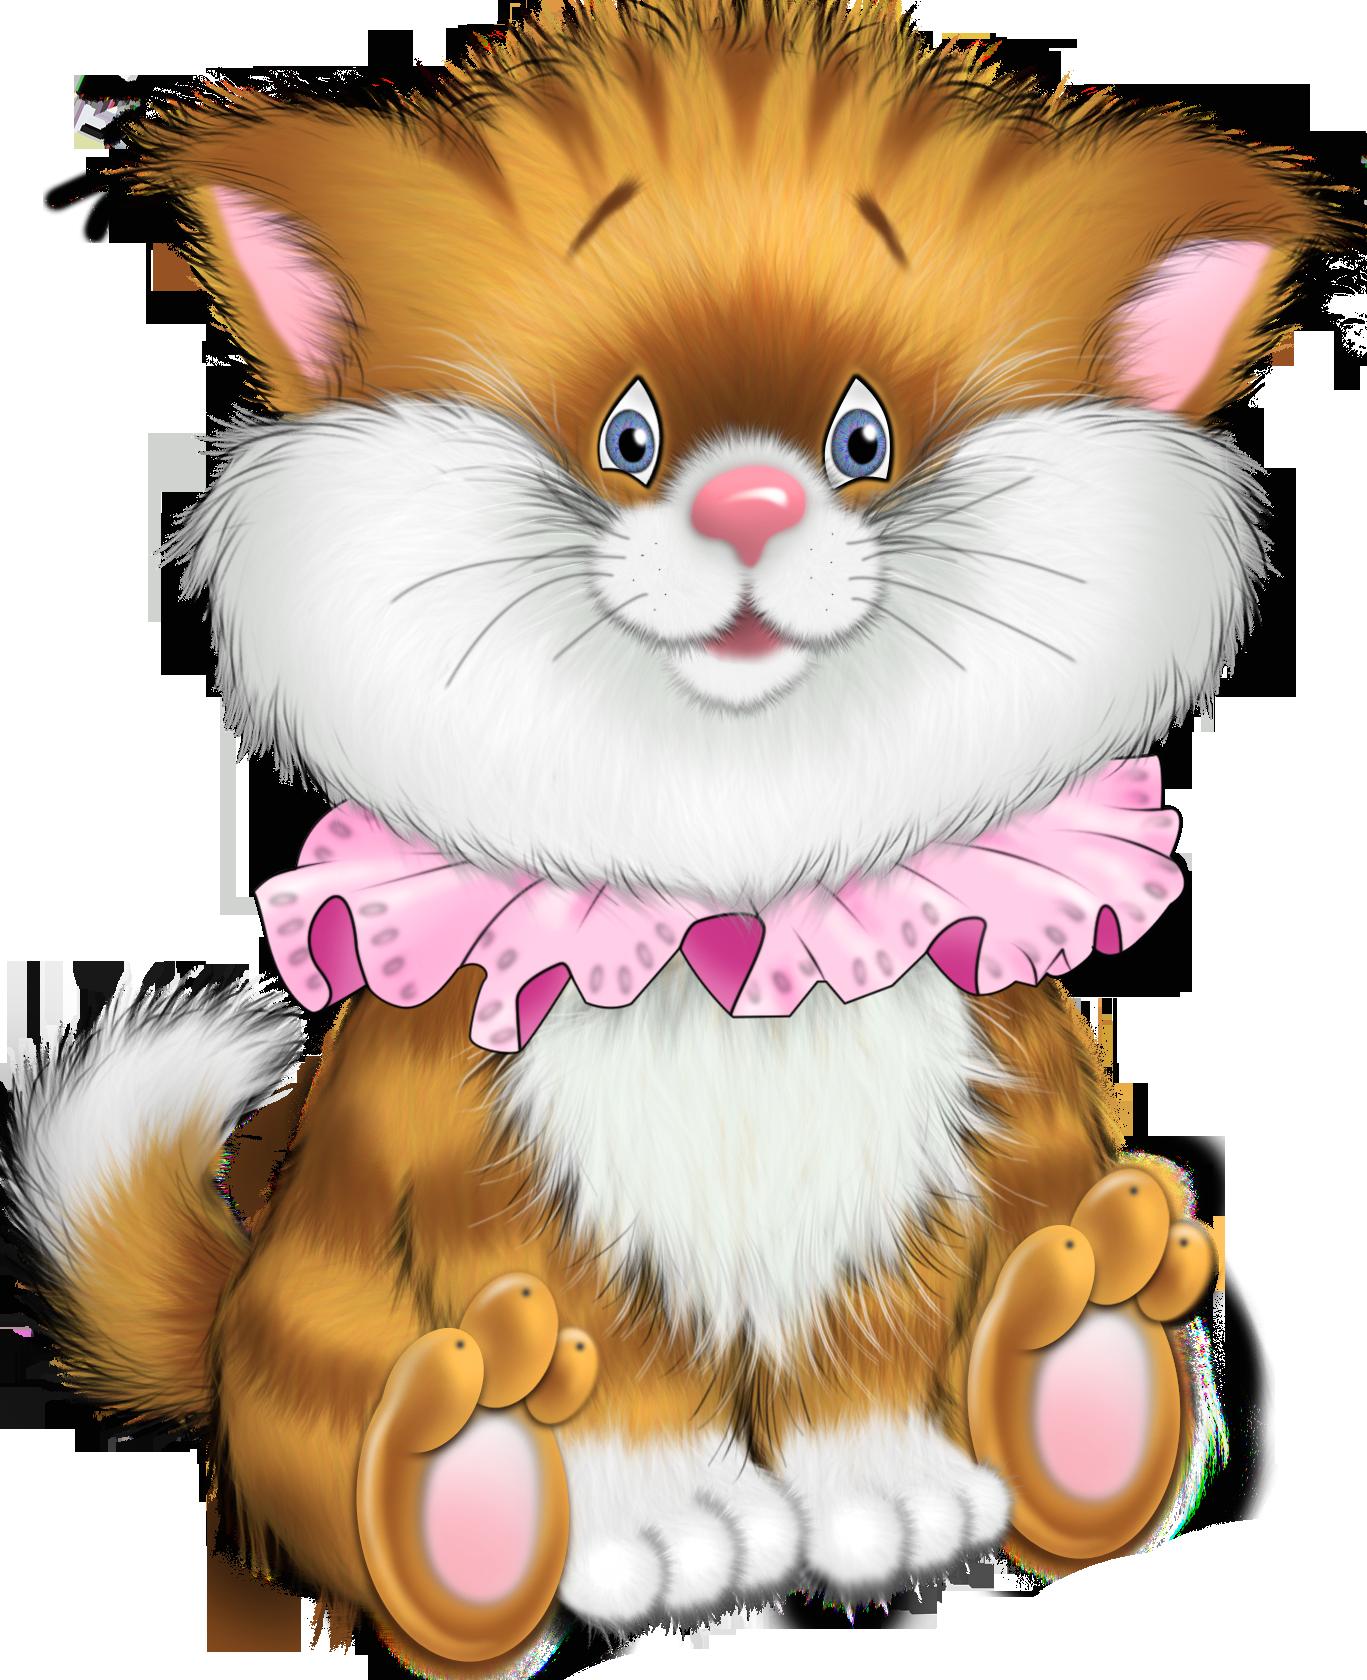 Kitten Cat Miscellaneous Clipart On Kitty Cats Clip Art And Image 2 Besplatnaya Grafika Detskie Kartinki Koshki